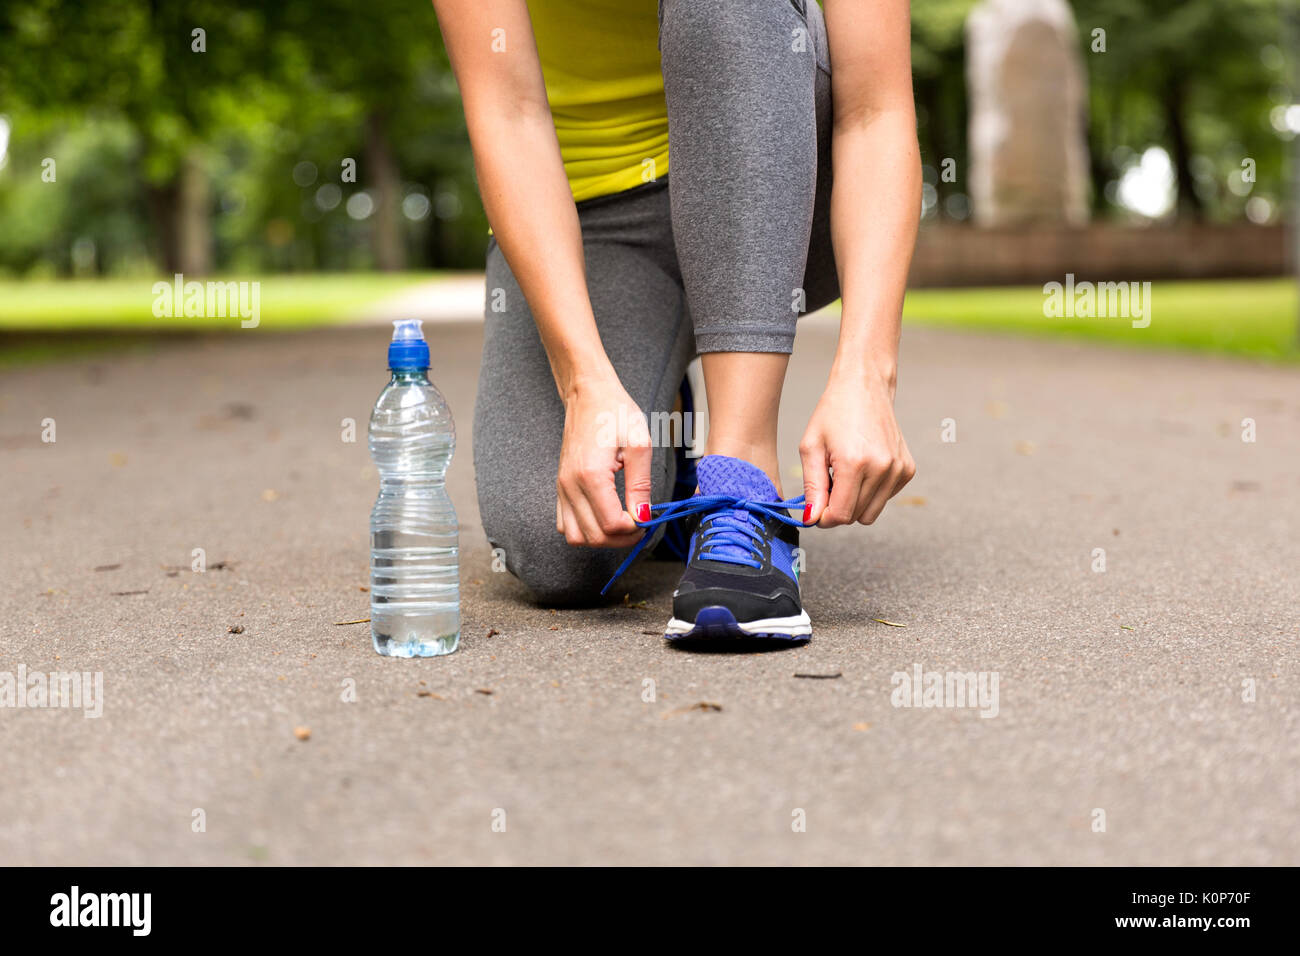 Junge Frau Schnürsenkel binden der Schuhe vor dem Training. Gesunder Lebensstil Konzept Stockbild